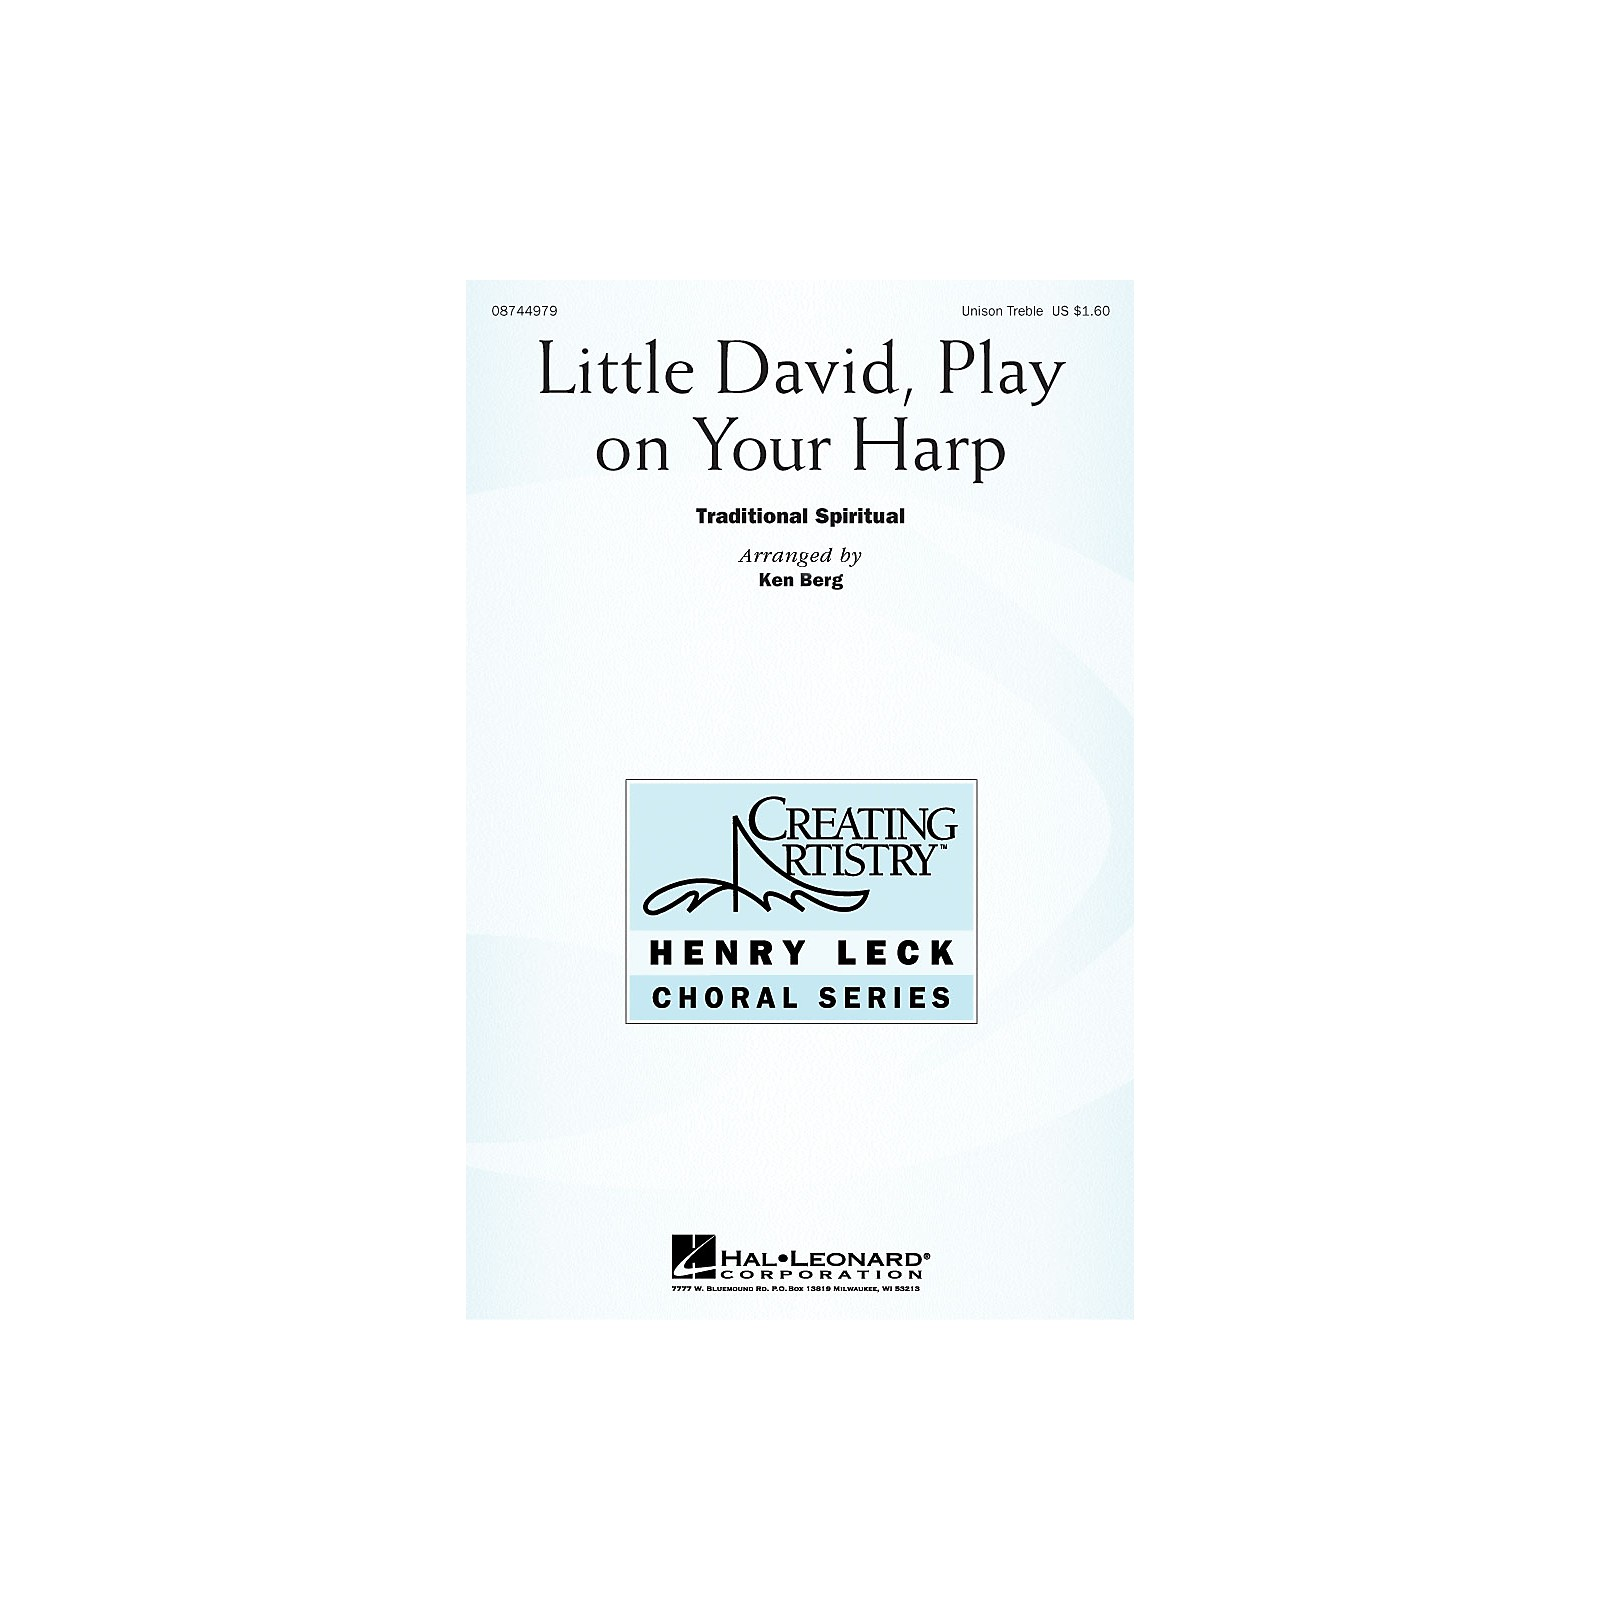 Hal Leonard Little David, Play on Your Harp Unison Treble arranged by Henry Leck